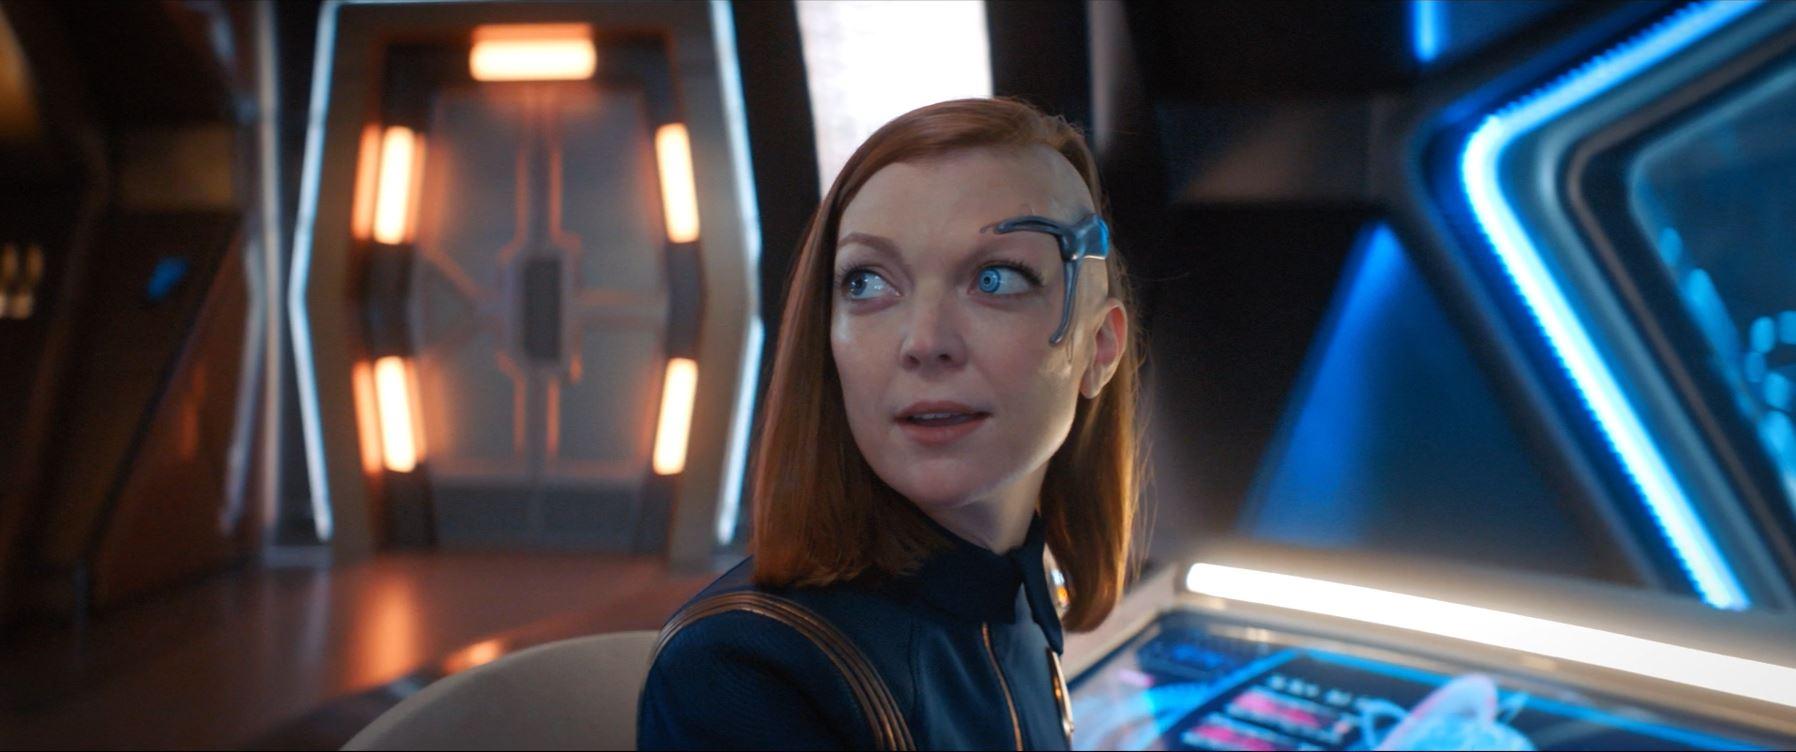 Keyla Detmer (Emily Coutts) - Star Trek Discovery S02E02 New Eden Review